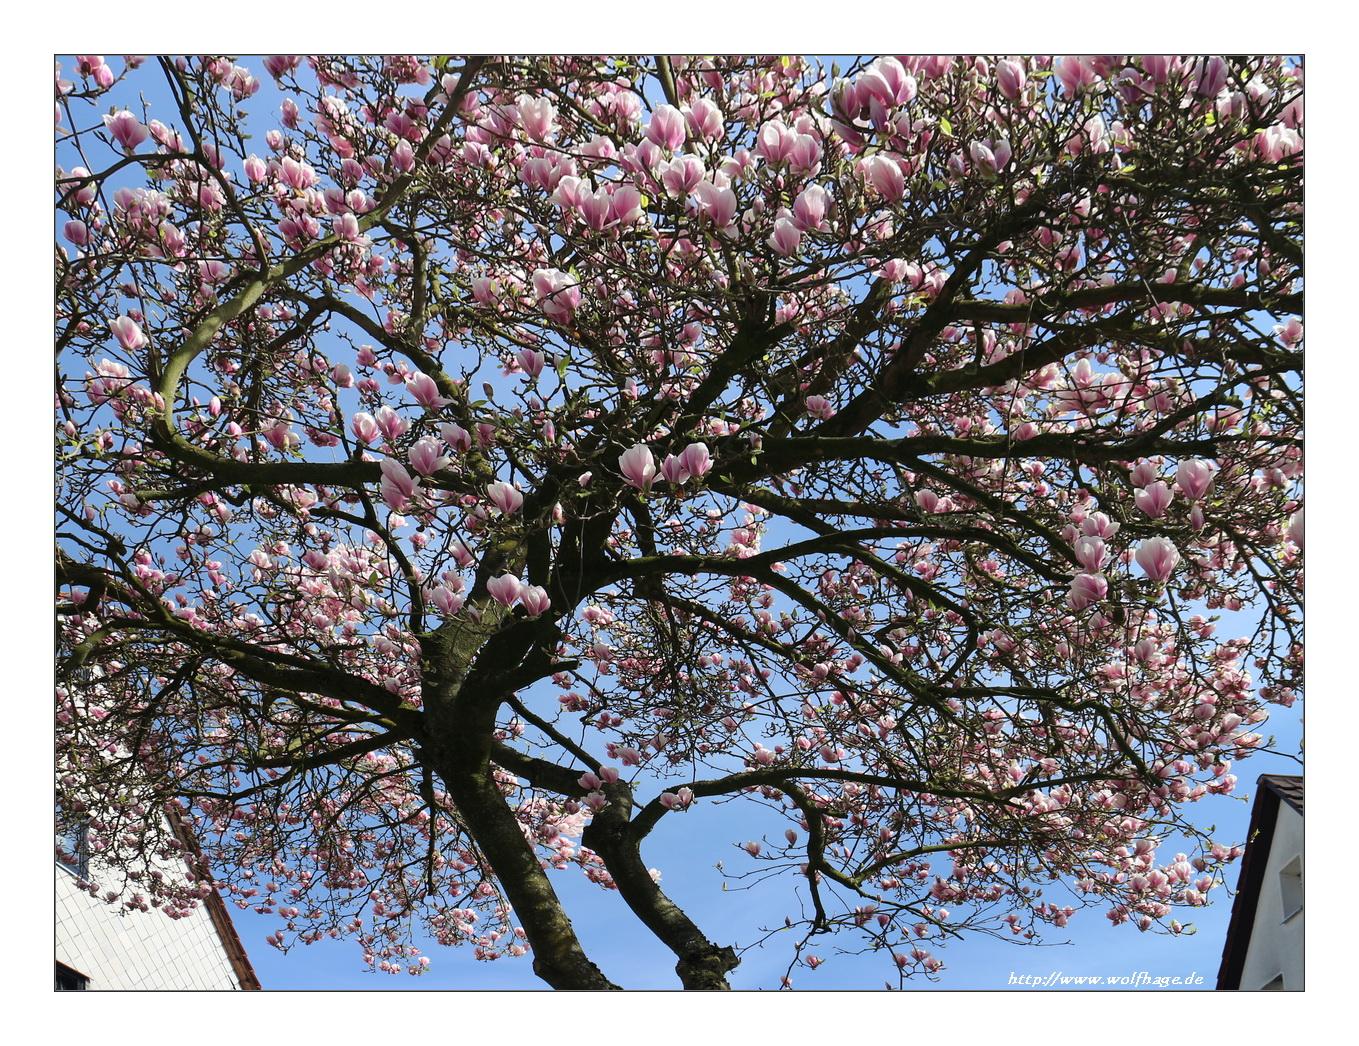 Das ist Frühling pur :-)